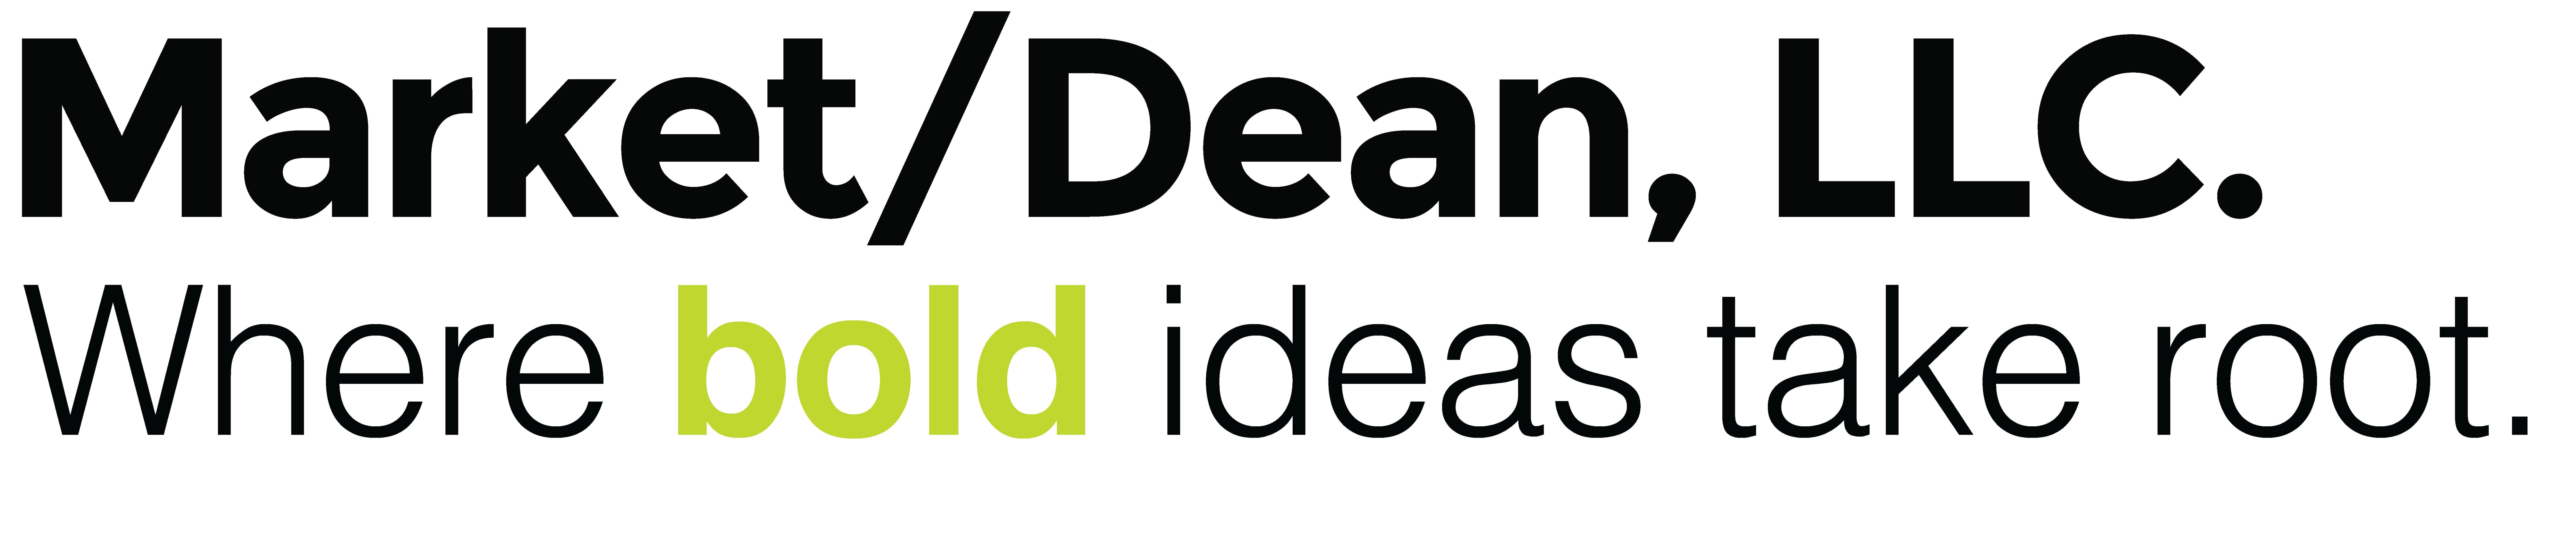 Market/Dean, LLC.